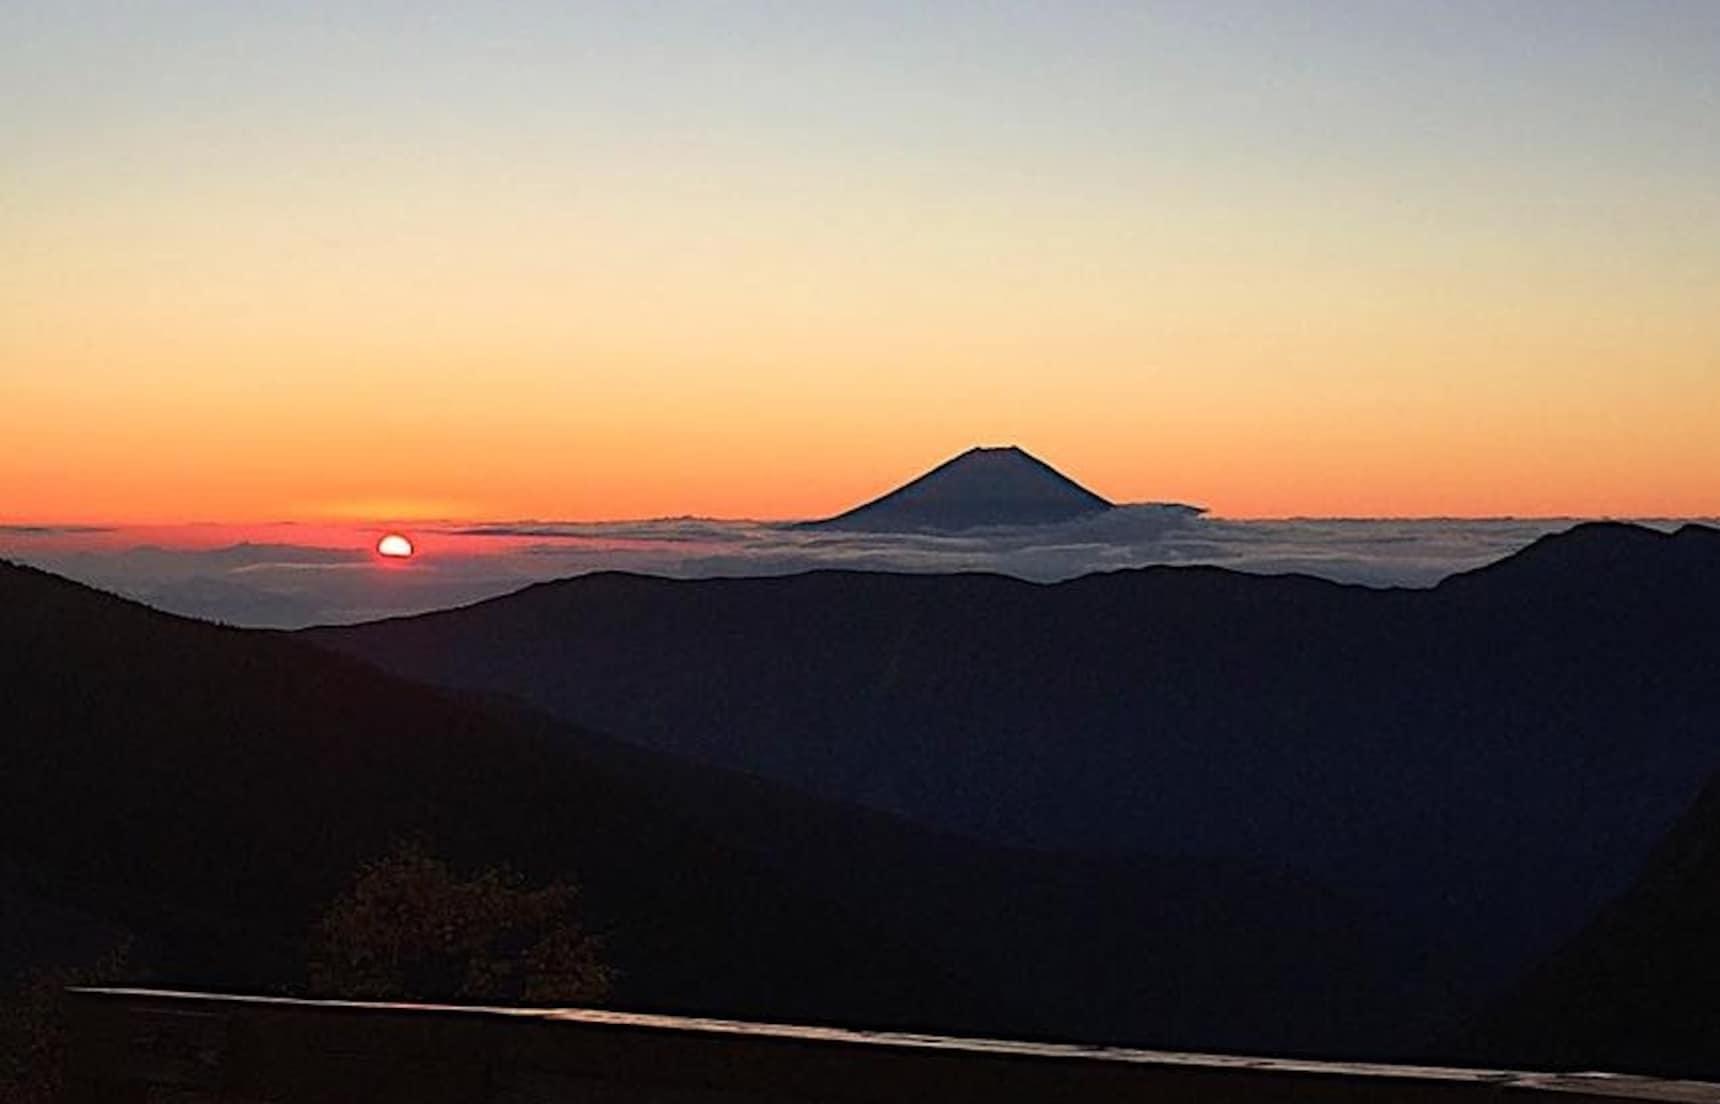 14 Stunning Sunrise & Sunset Spots in Japan